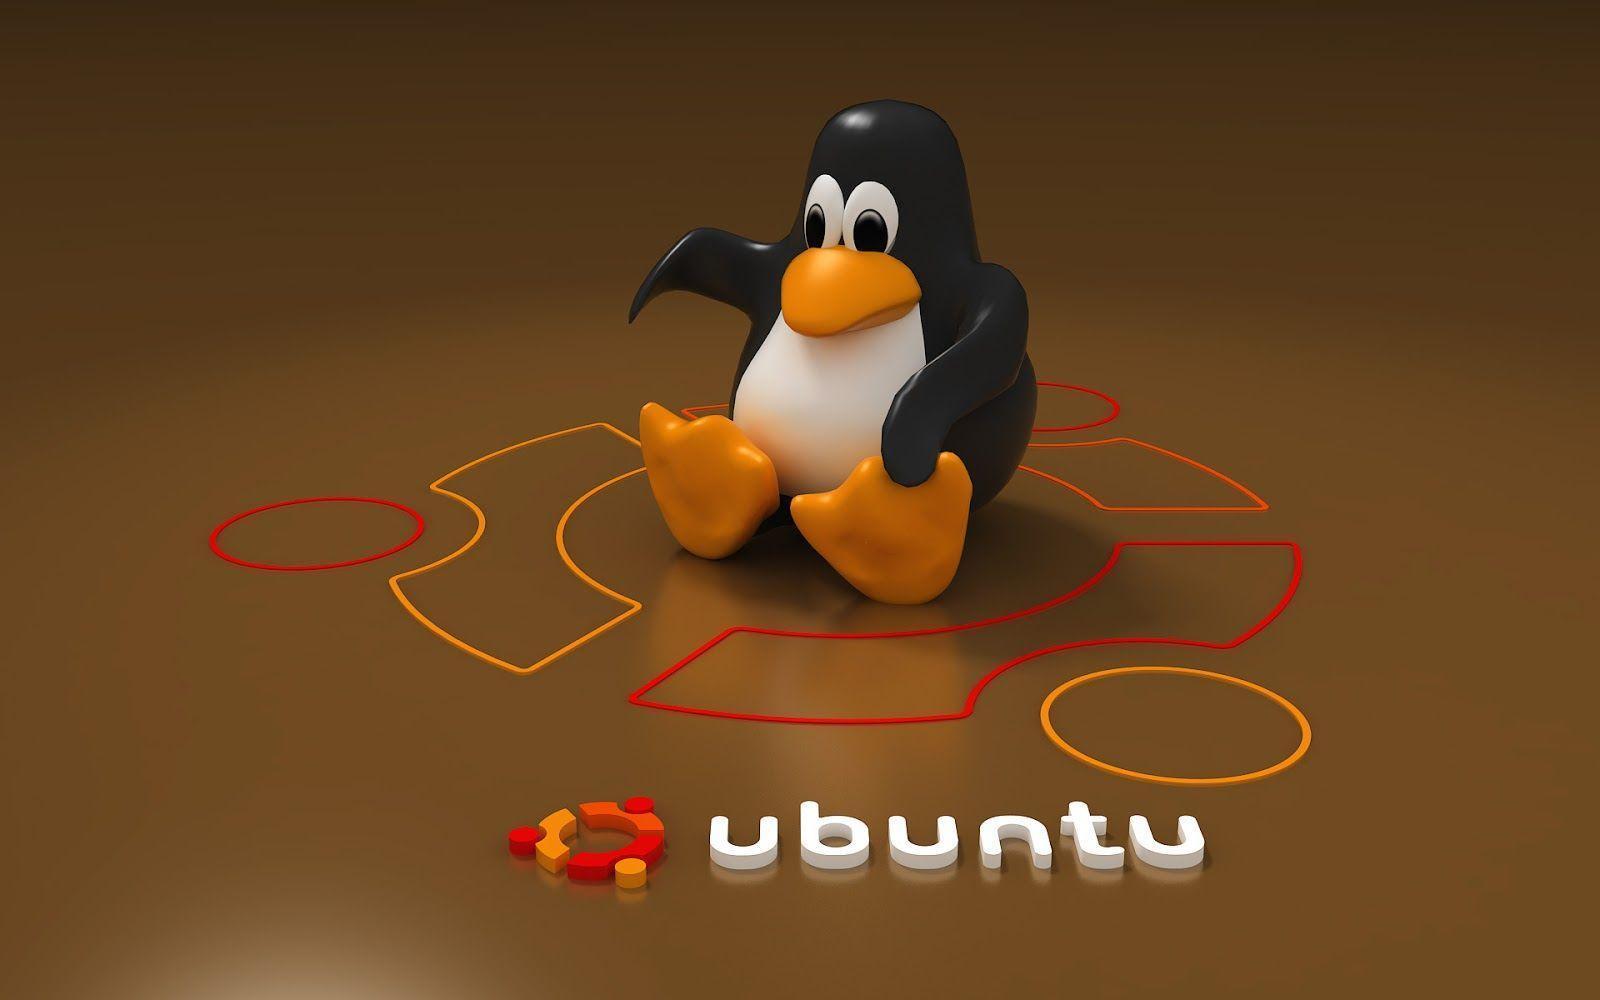 Ubuntu HD Wallpapers